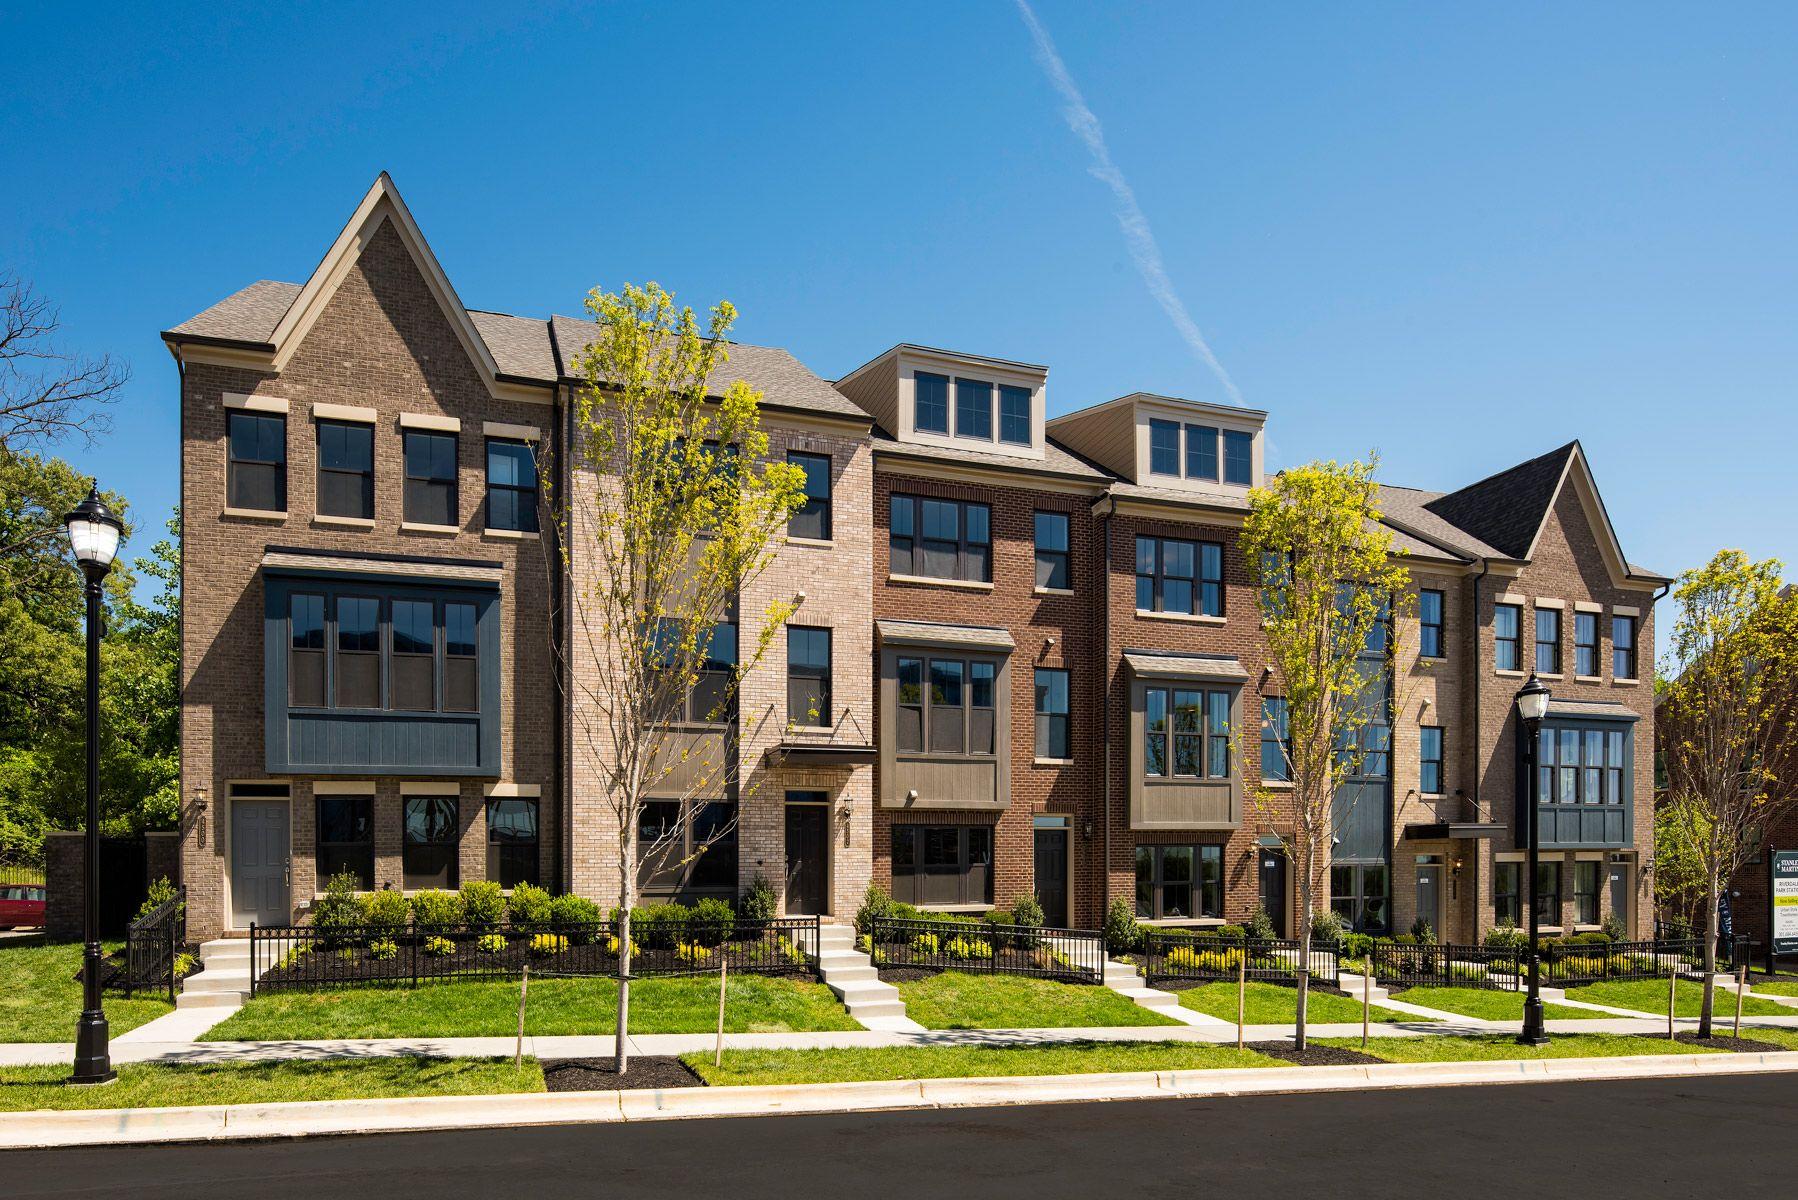 Riverdale Park Station In Maryland Riverdale Park New Homes For Sale Exterior